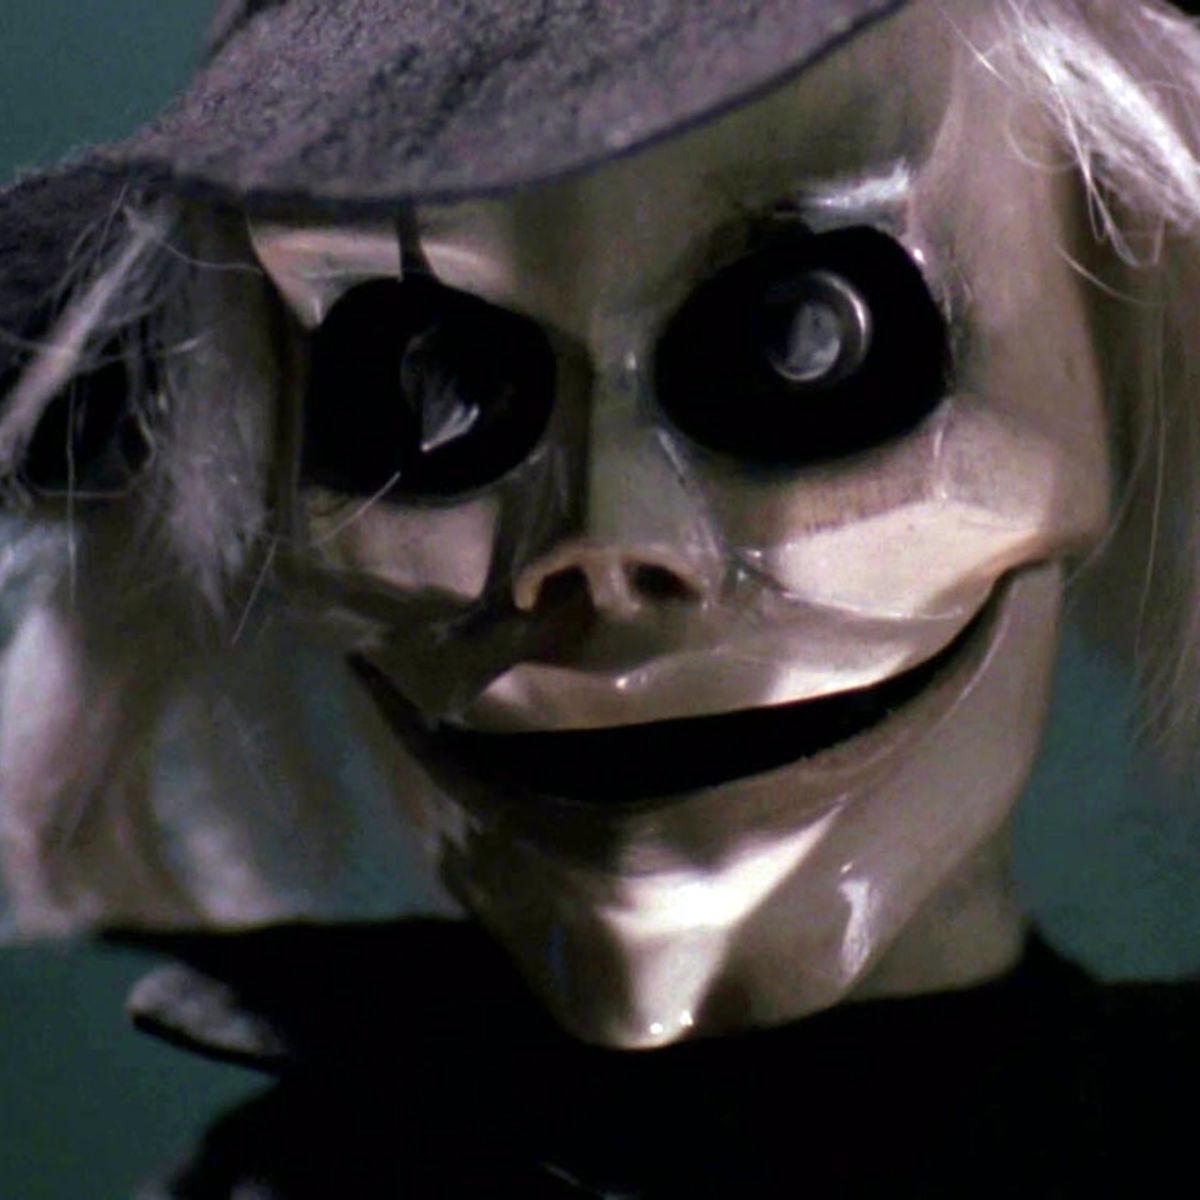 puppet-master-pic-1.jpg